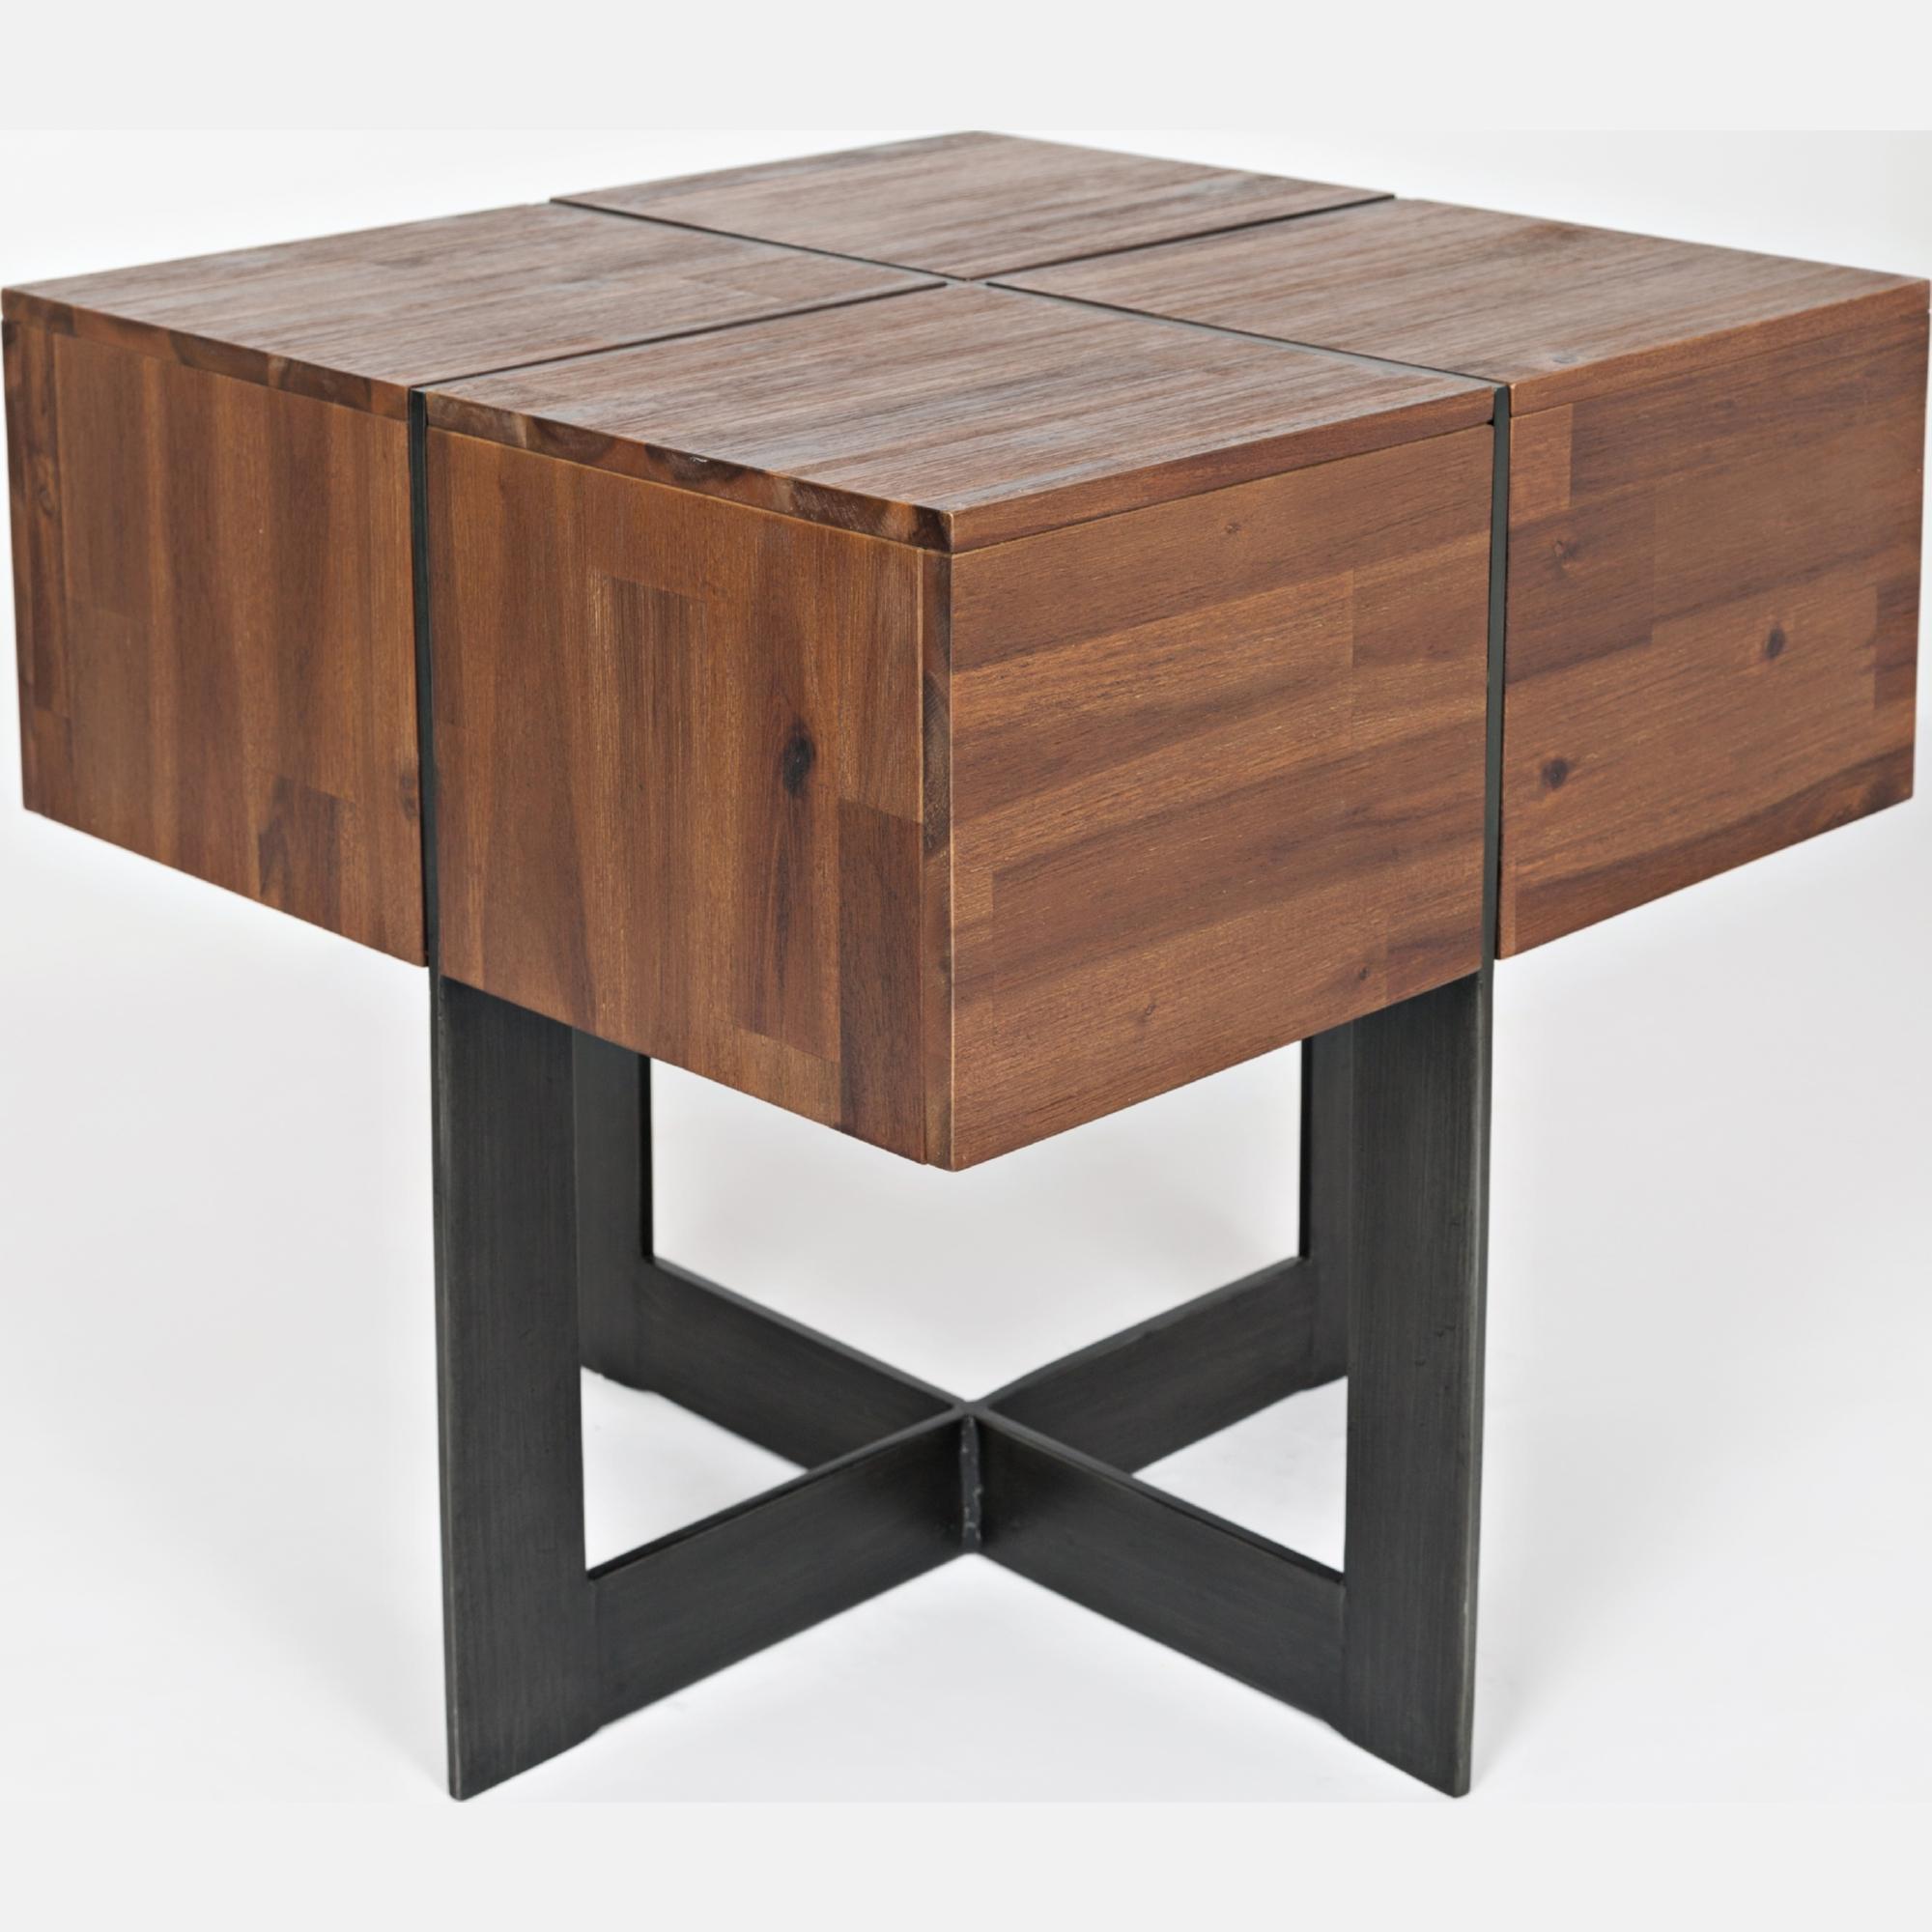 Jofran 1660 6 Studio 16 Floating End Table w Geometric X Base in